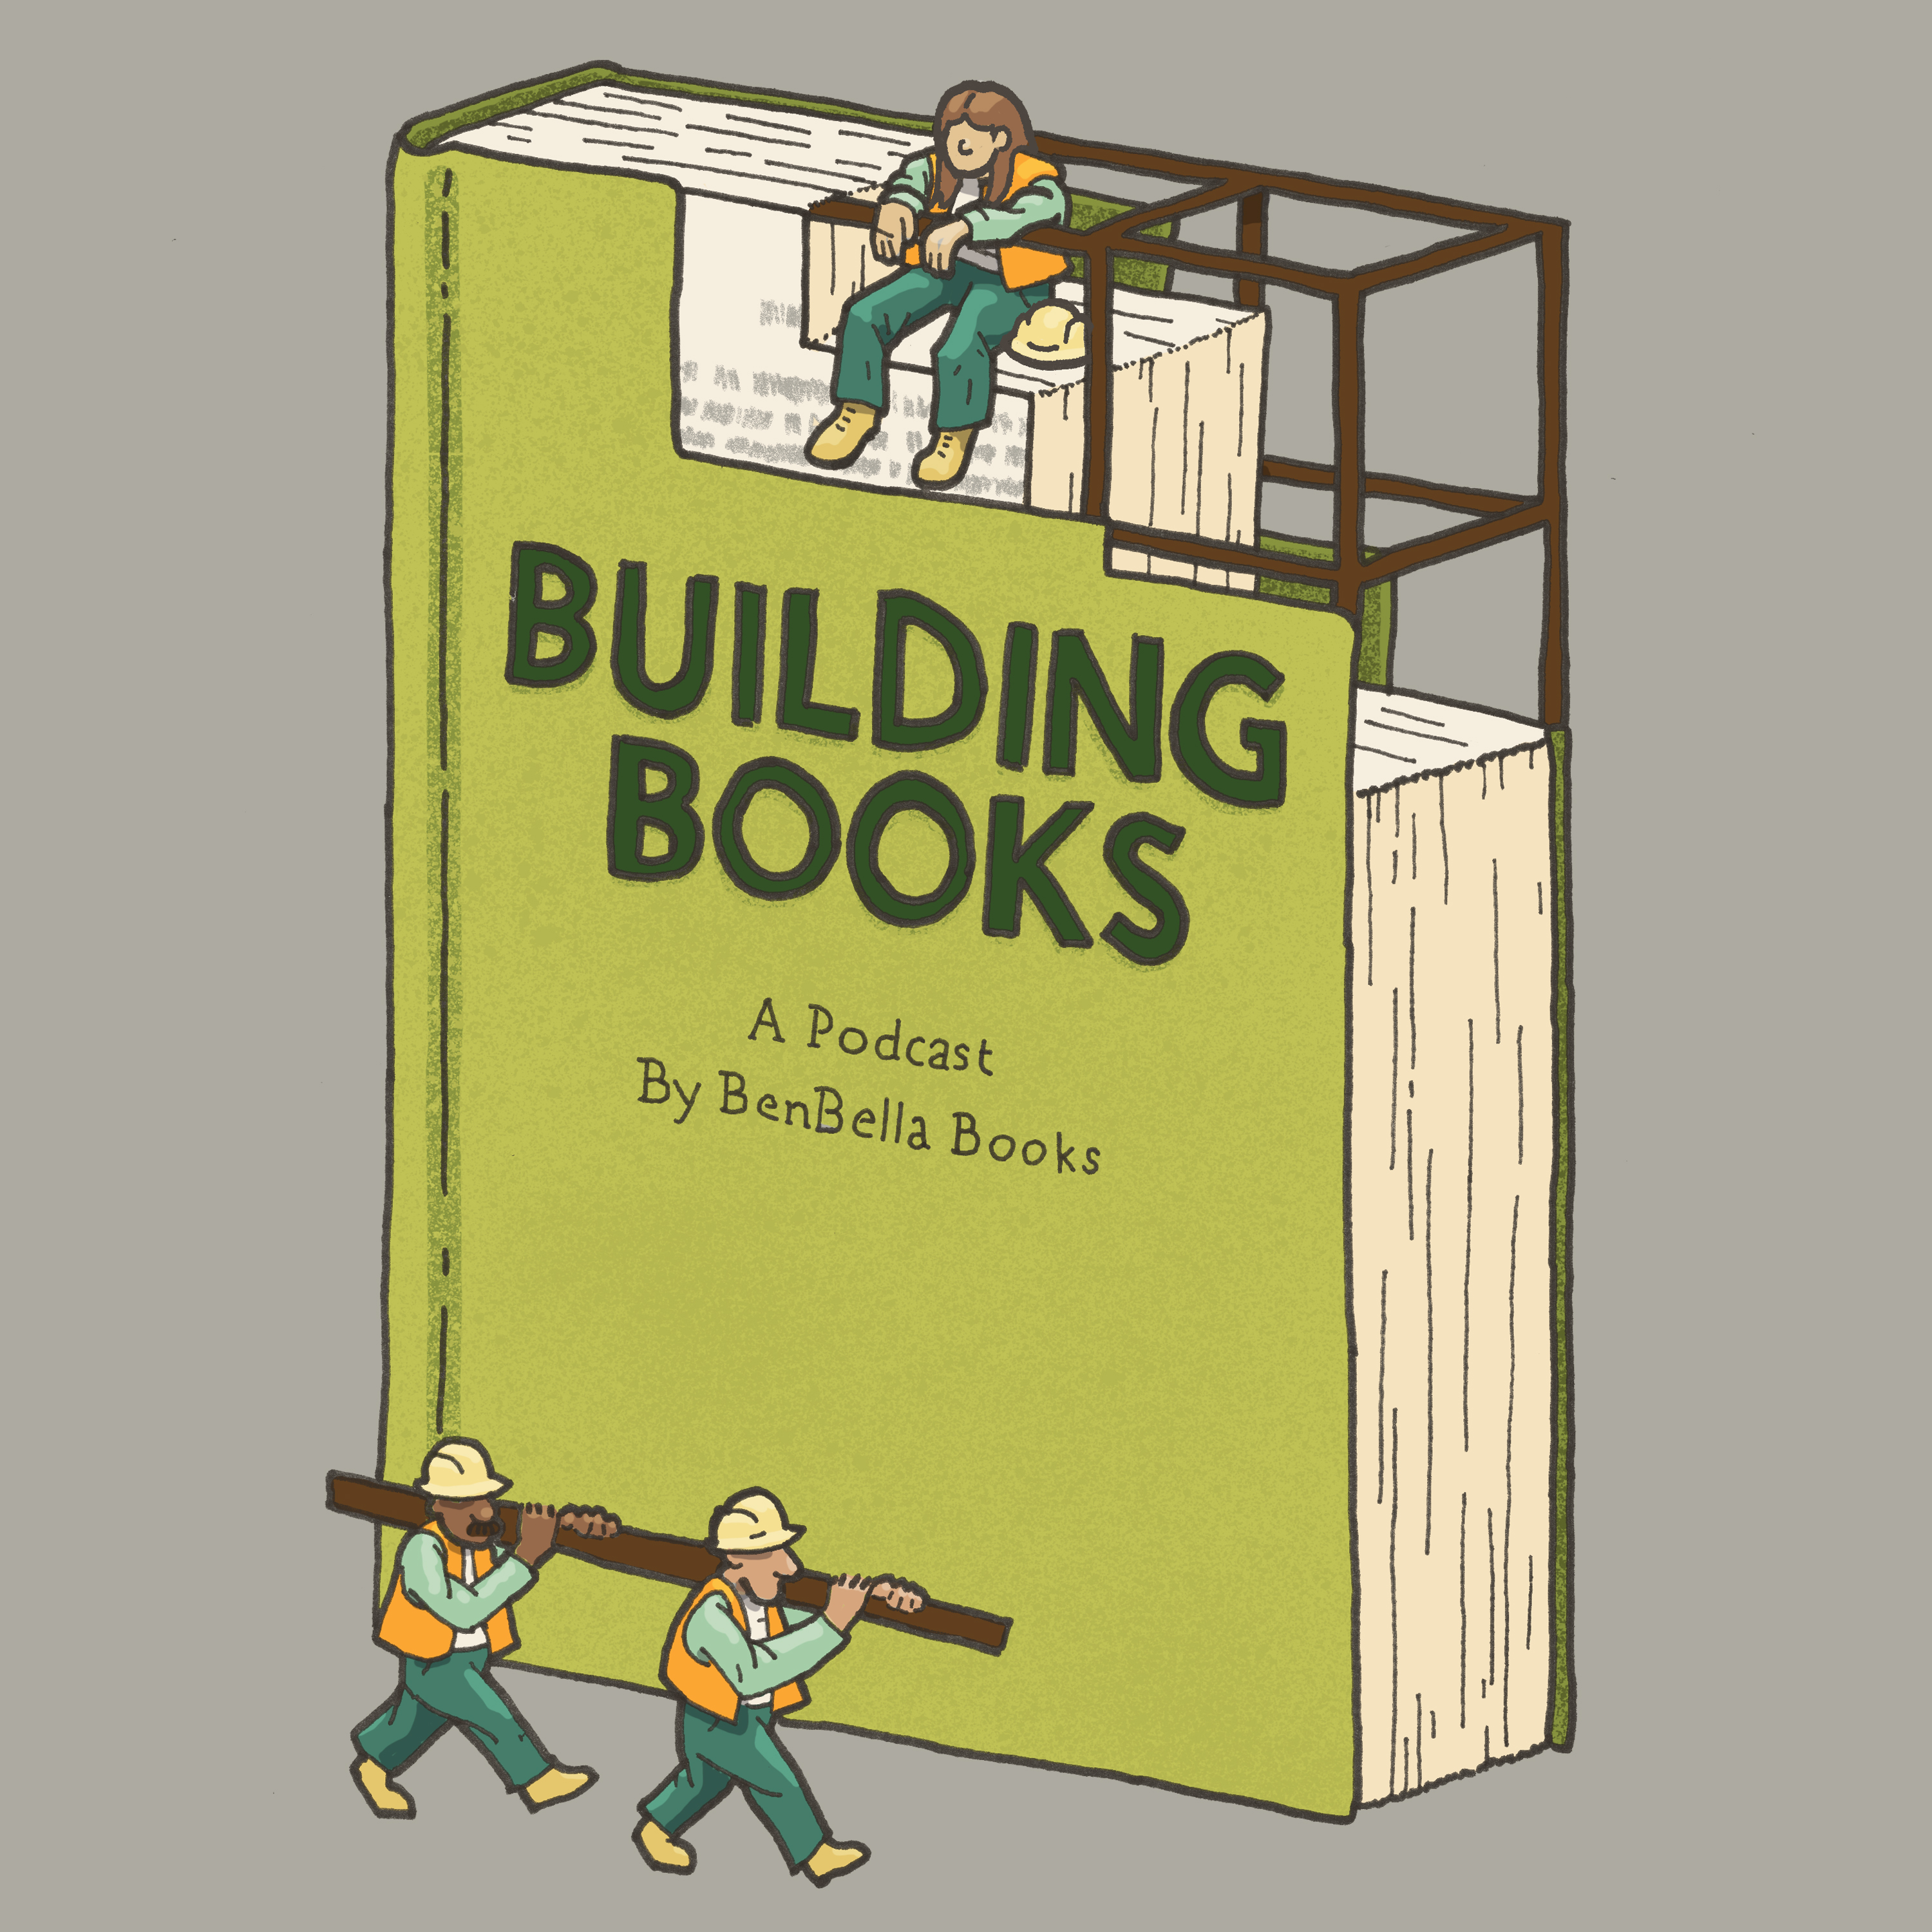 Building Books Podcast